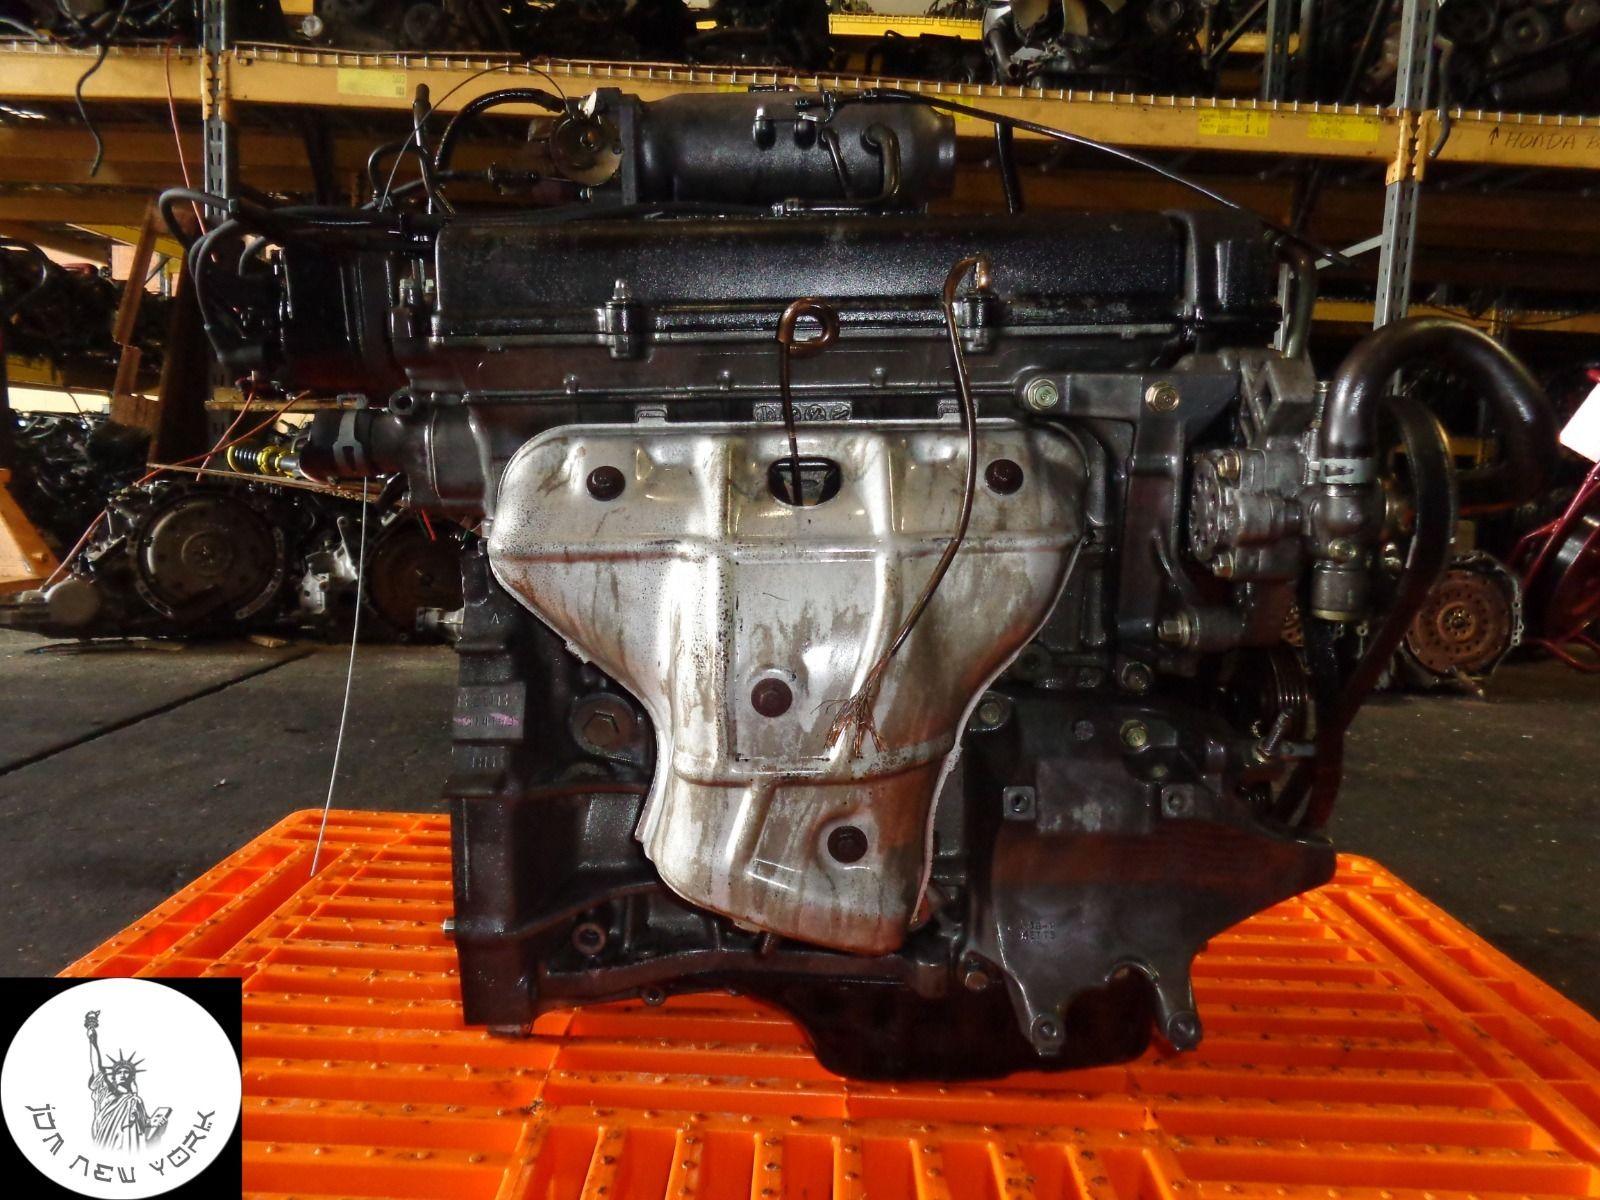 HONDA CRV CRX CIVIC ACURA INTEGRA 2.0L DOHC ENGINE JDM B20B LOW COMPRESSION B20 - JDM New York